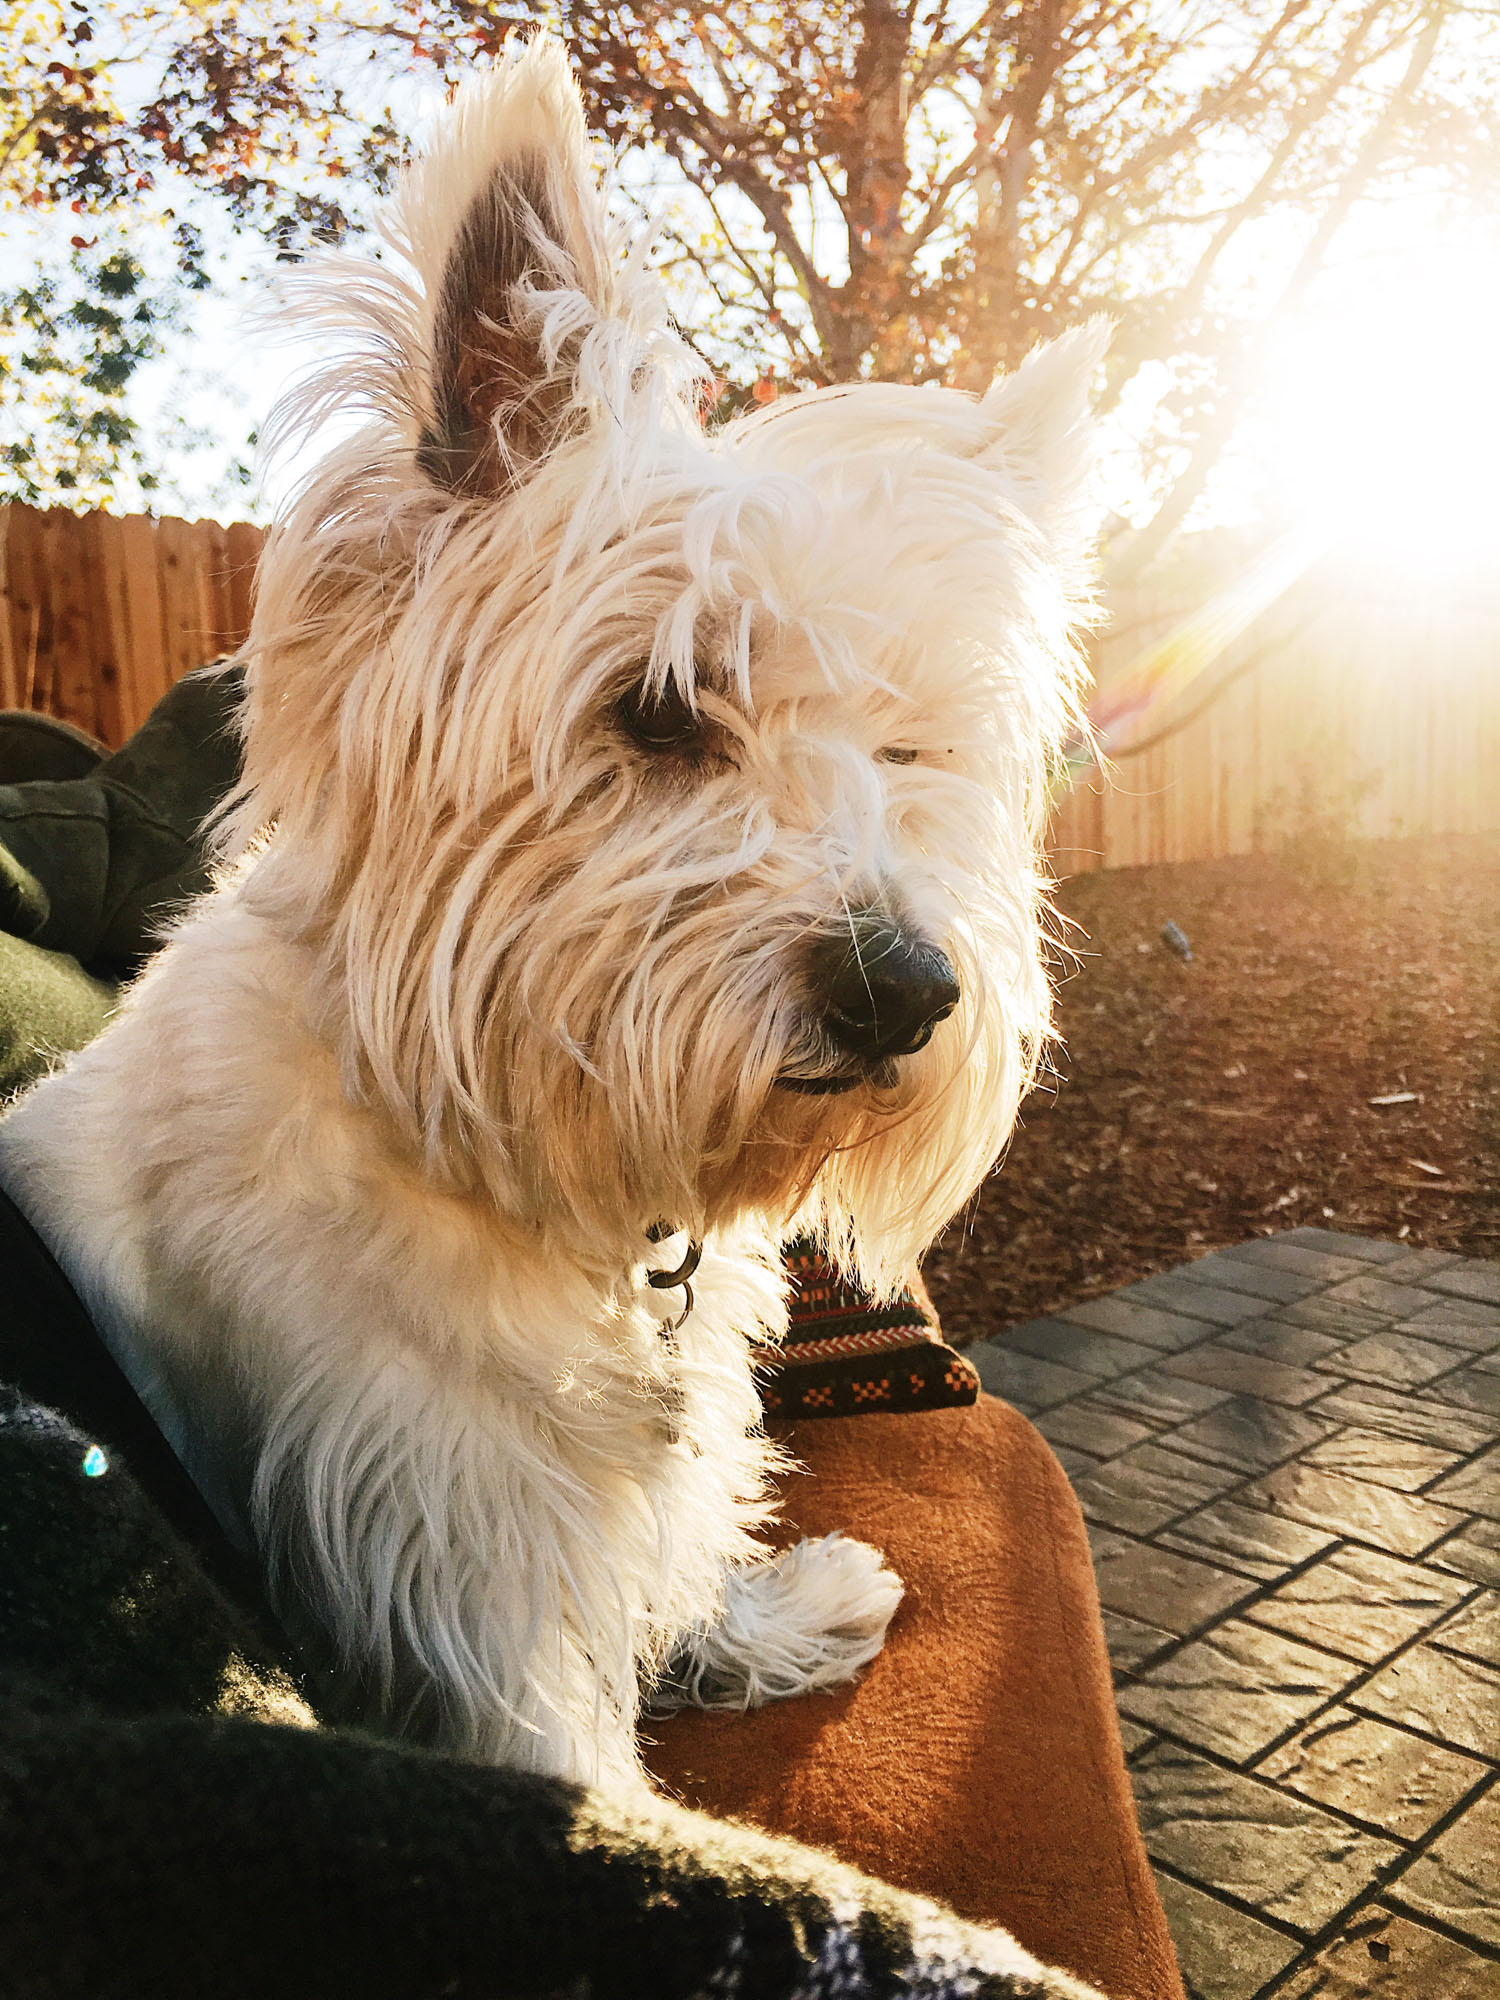 A portrait of the author Megan's West Highland Terrier (RIP).